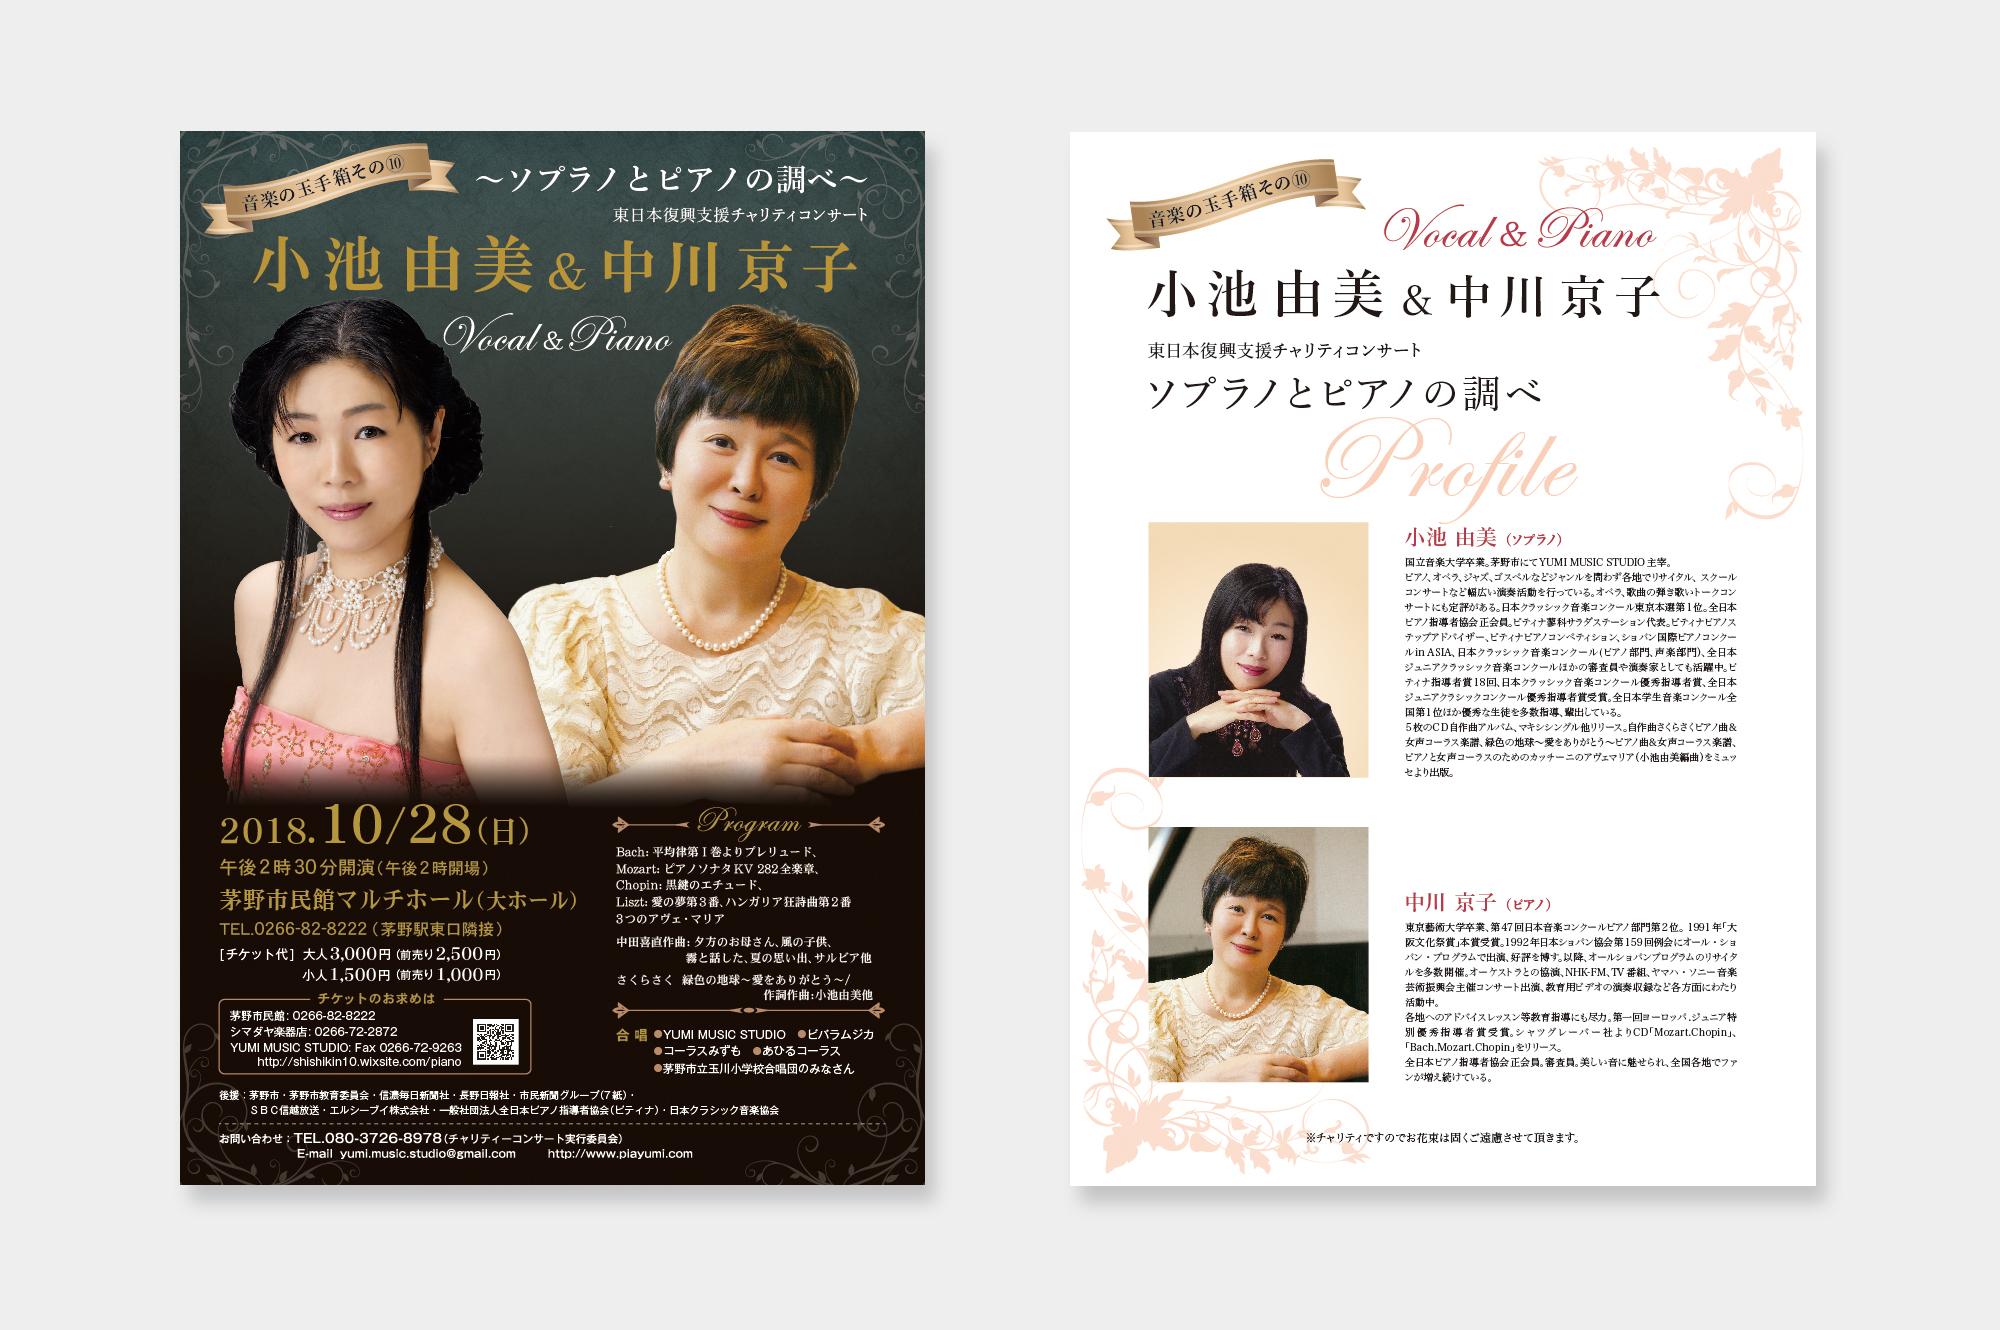 A4フライヤー(YUMI MUSIC STUDIO様)